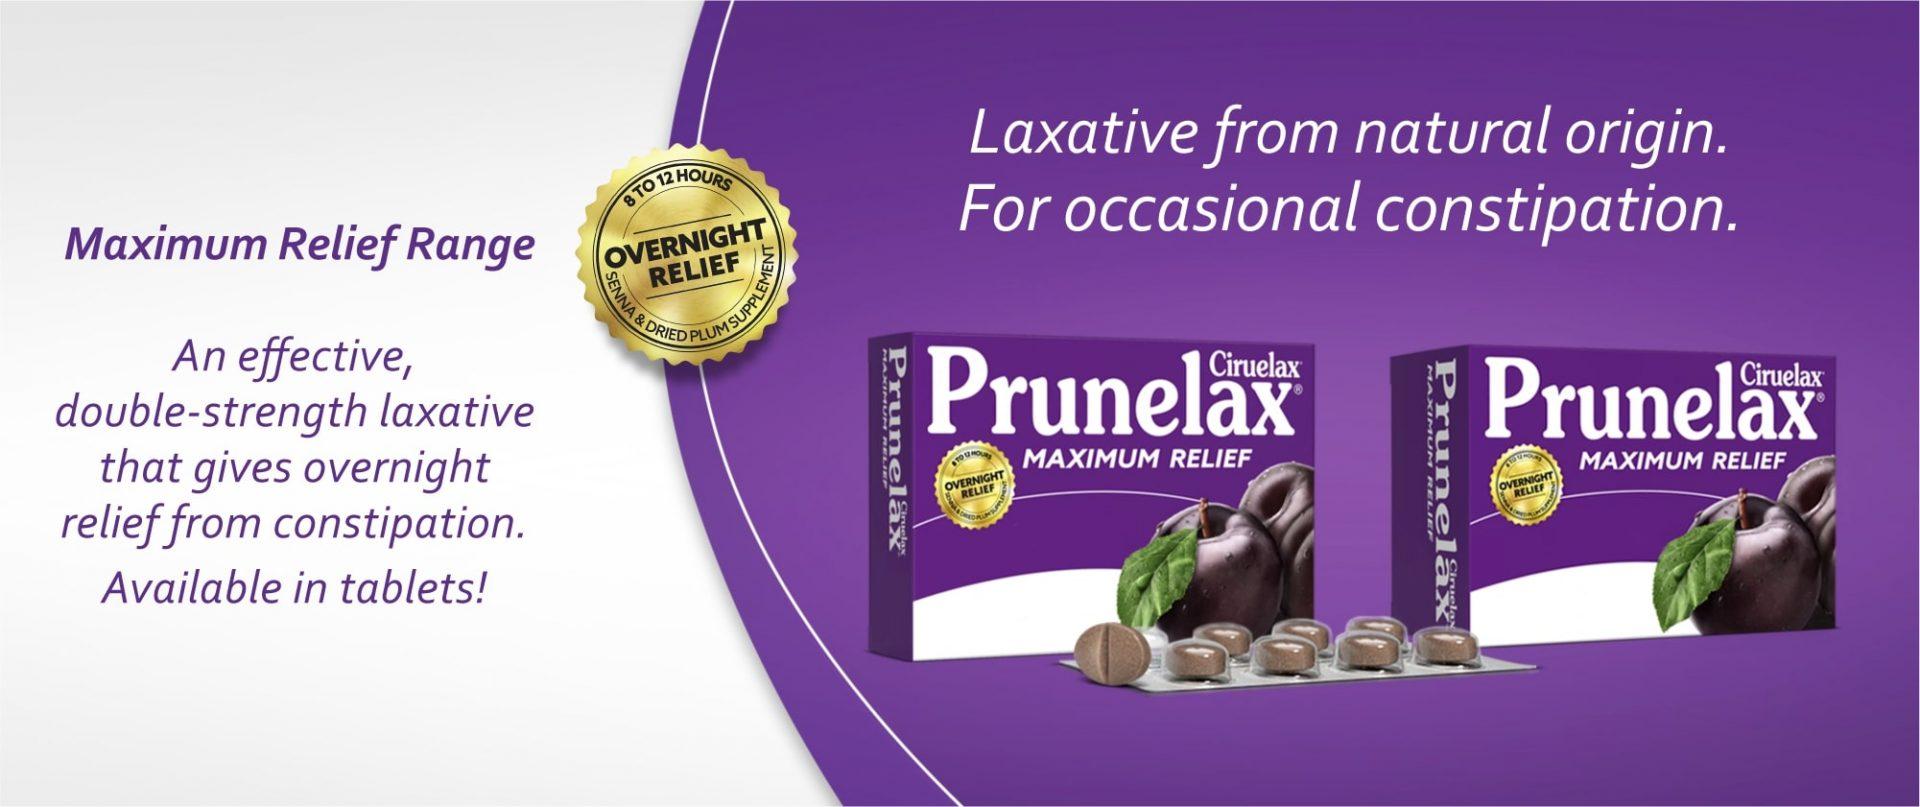 Prunela Ciruelax - Laxative